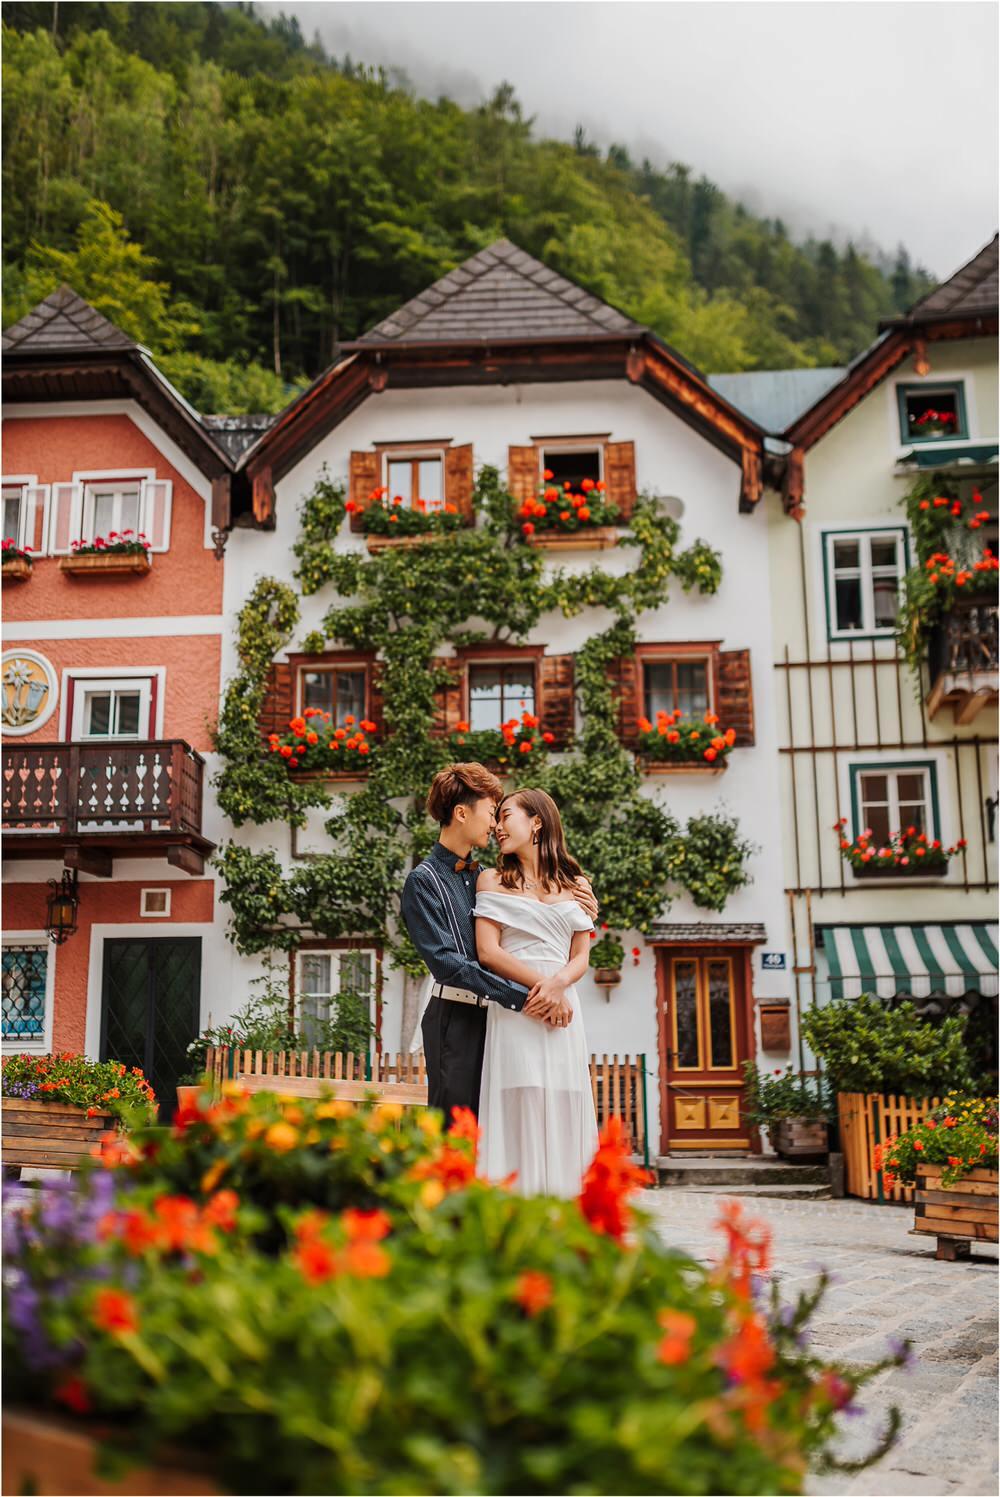 hallstatt austria wedding engagement photographer asian proposal surprise photography recommended nature professional 0013.jpg